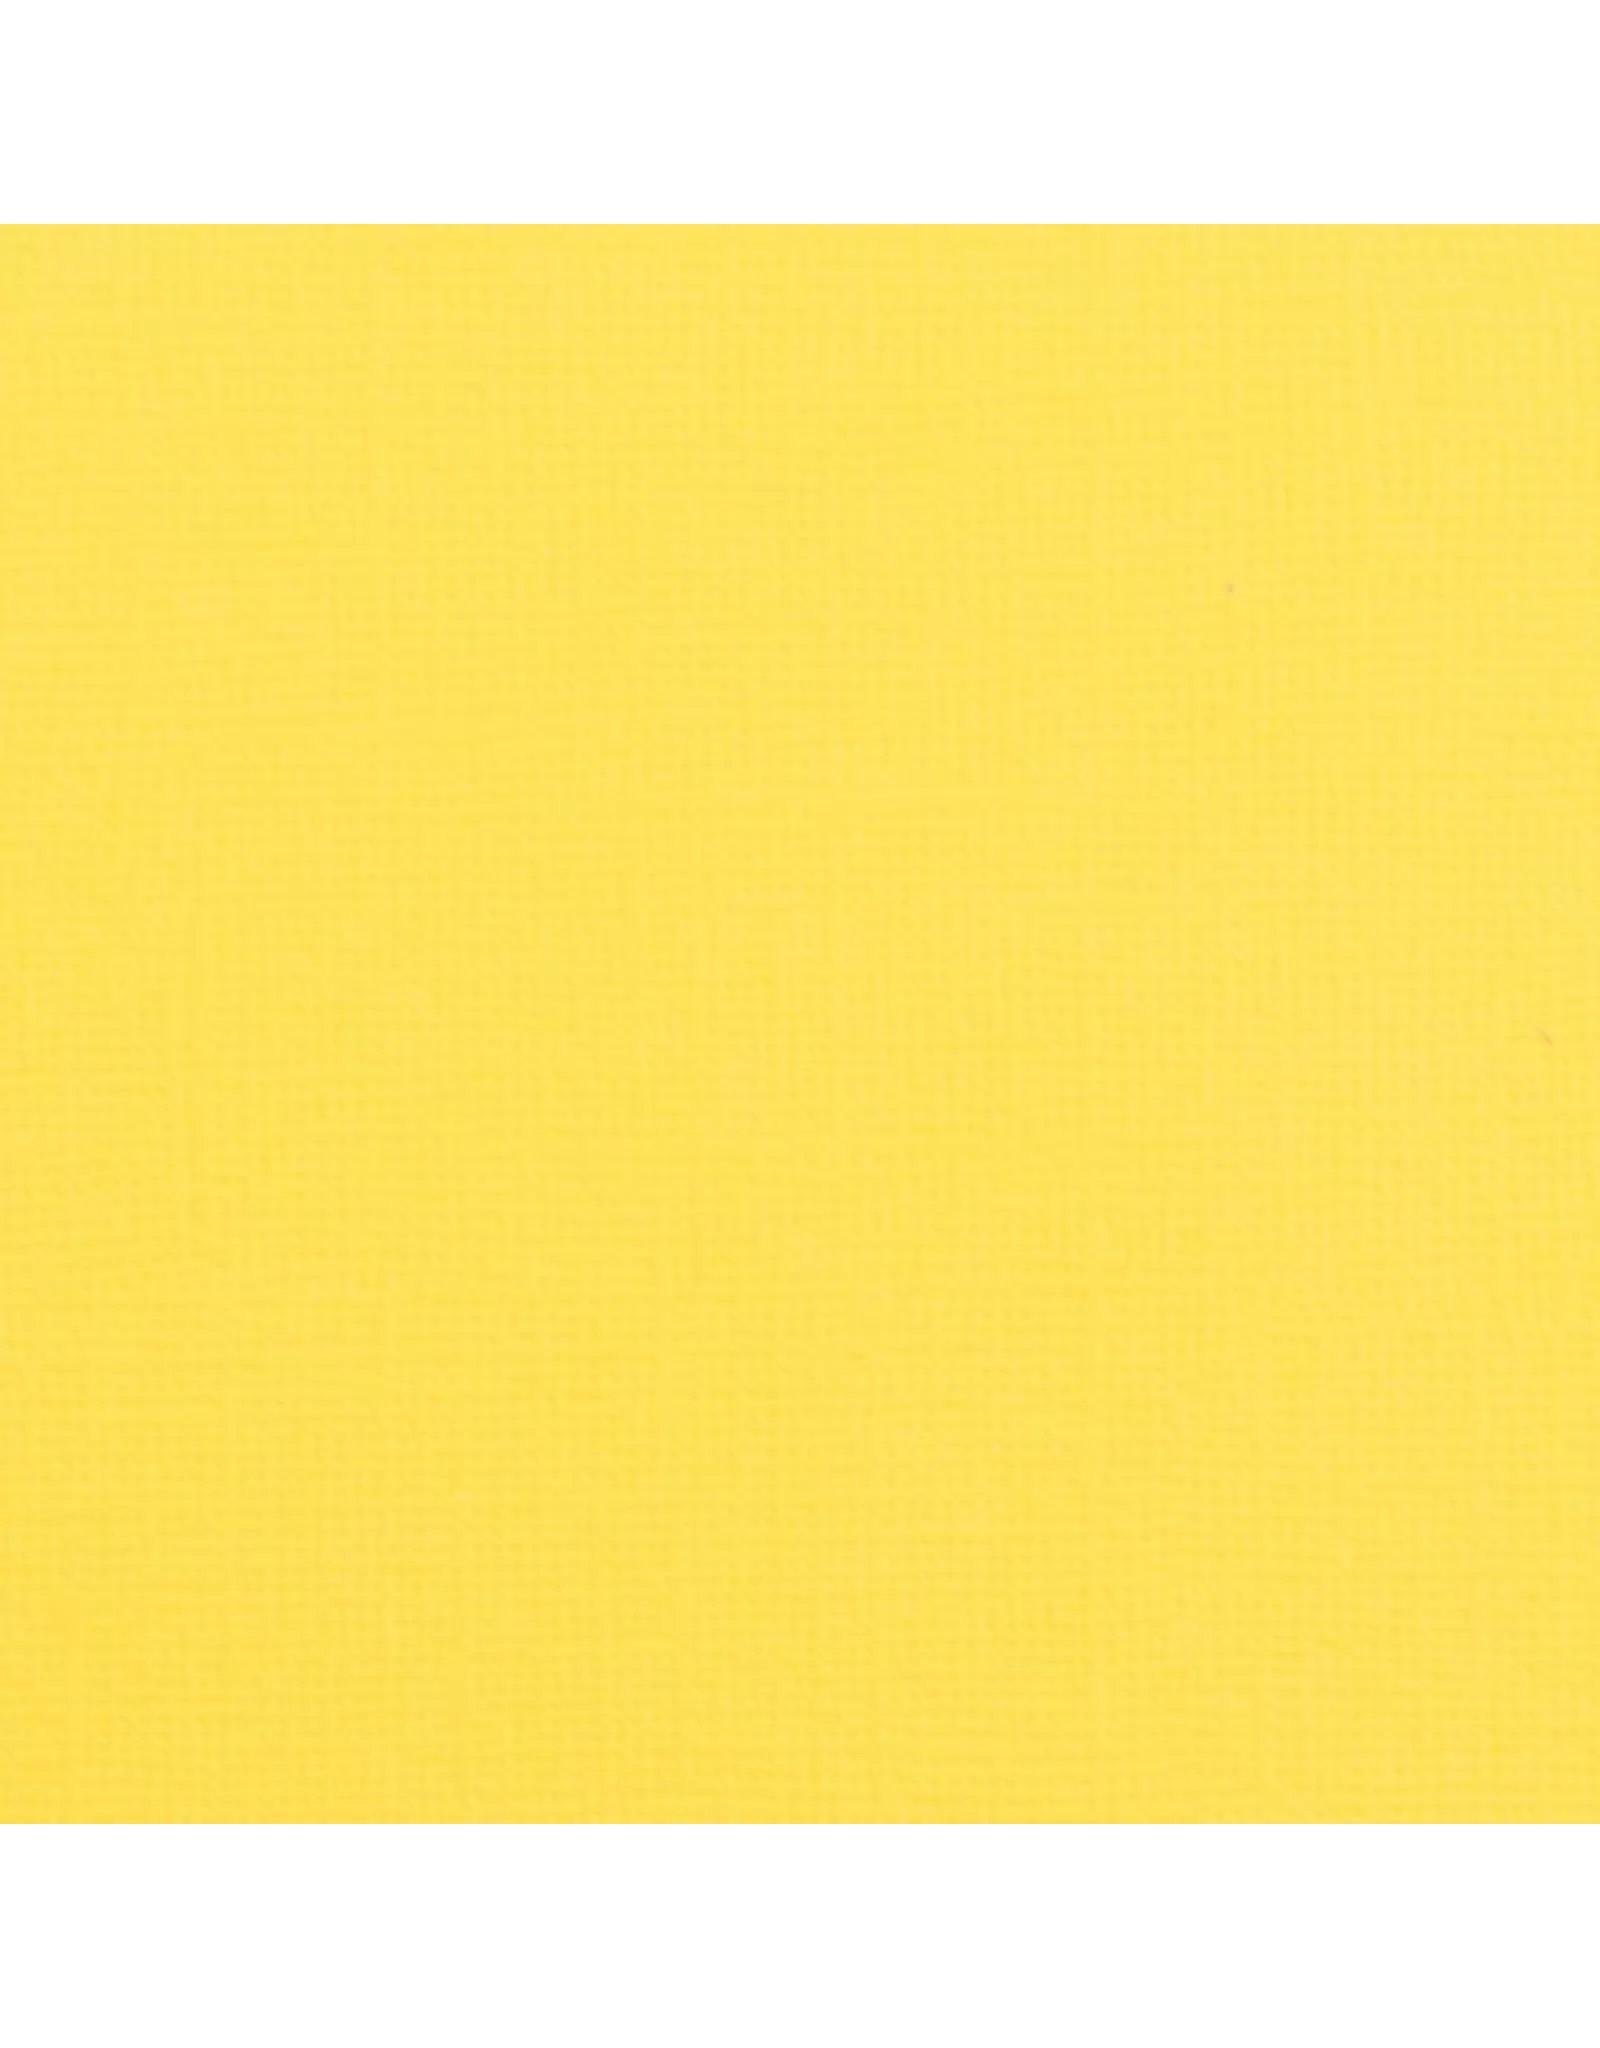 Vaessen Creative Florence • Cardstock texture 30,5x30,5cm Lemon yellow